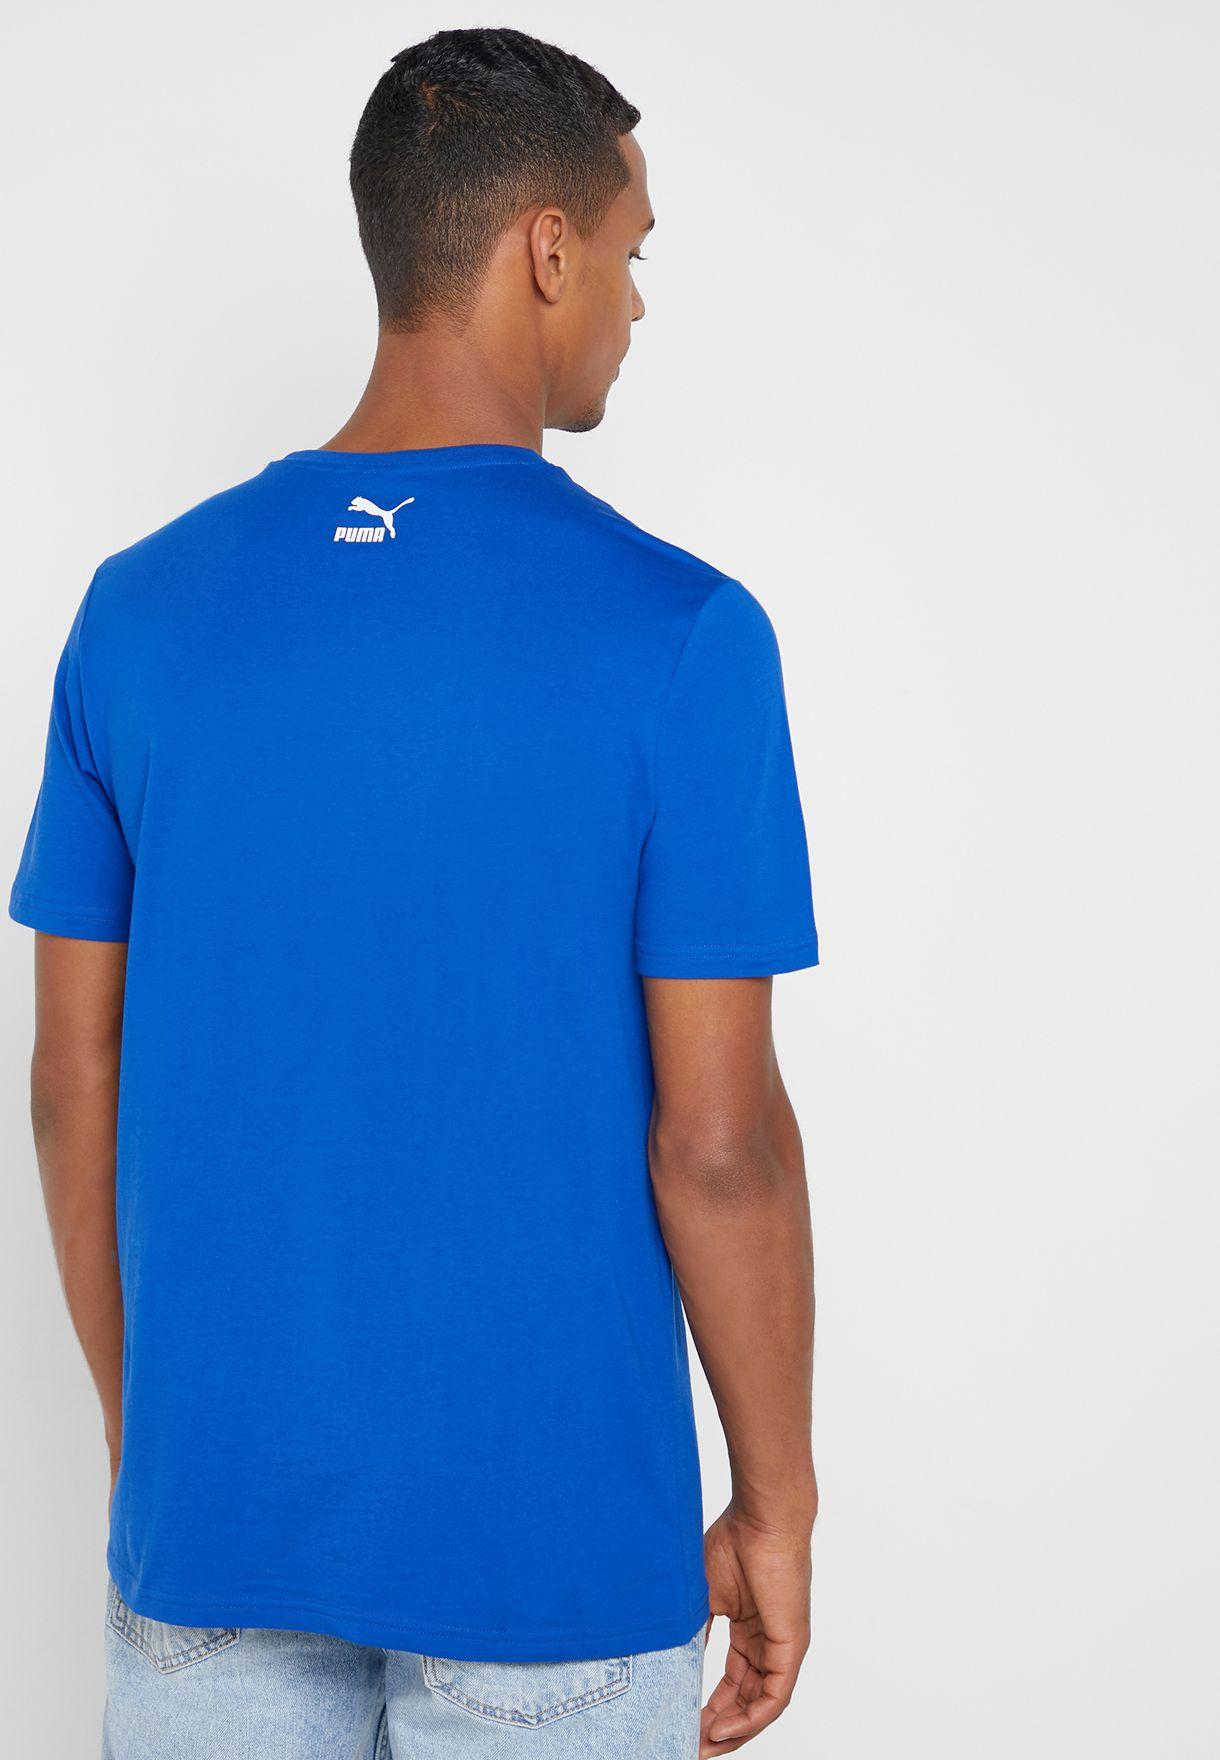 XTG Graphic T-Shirt